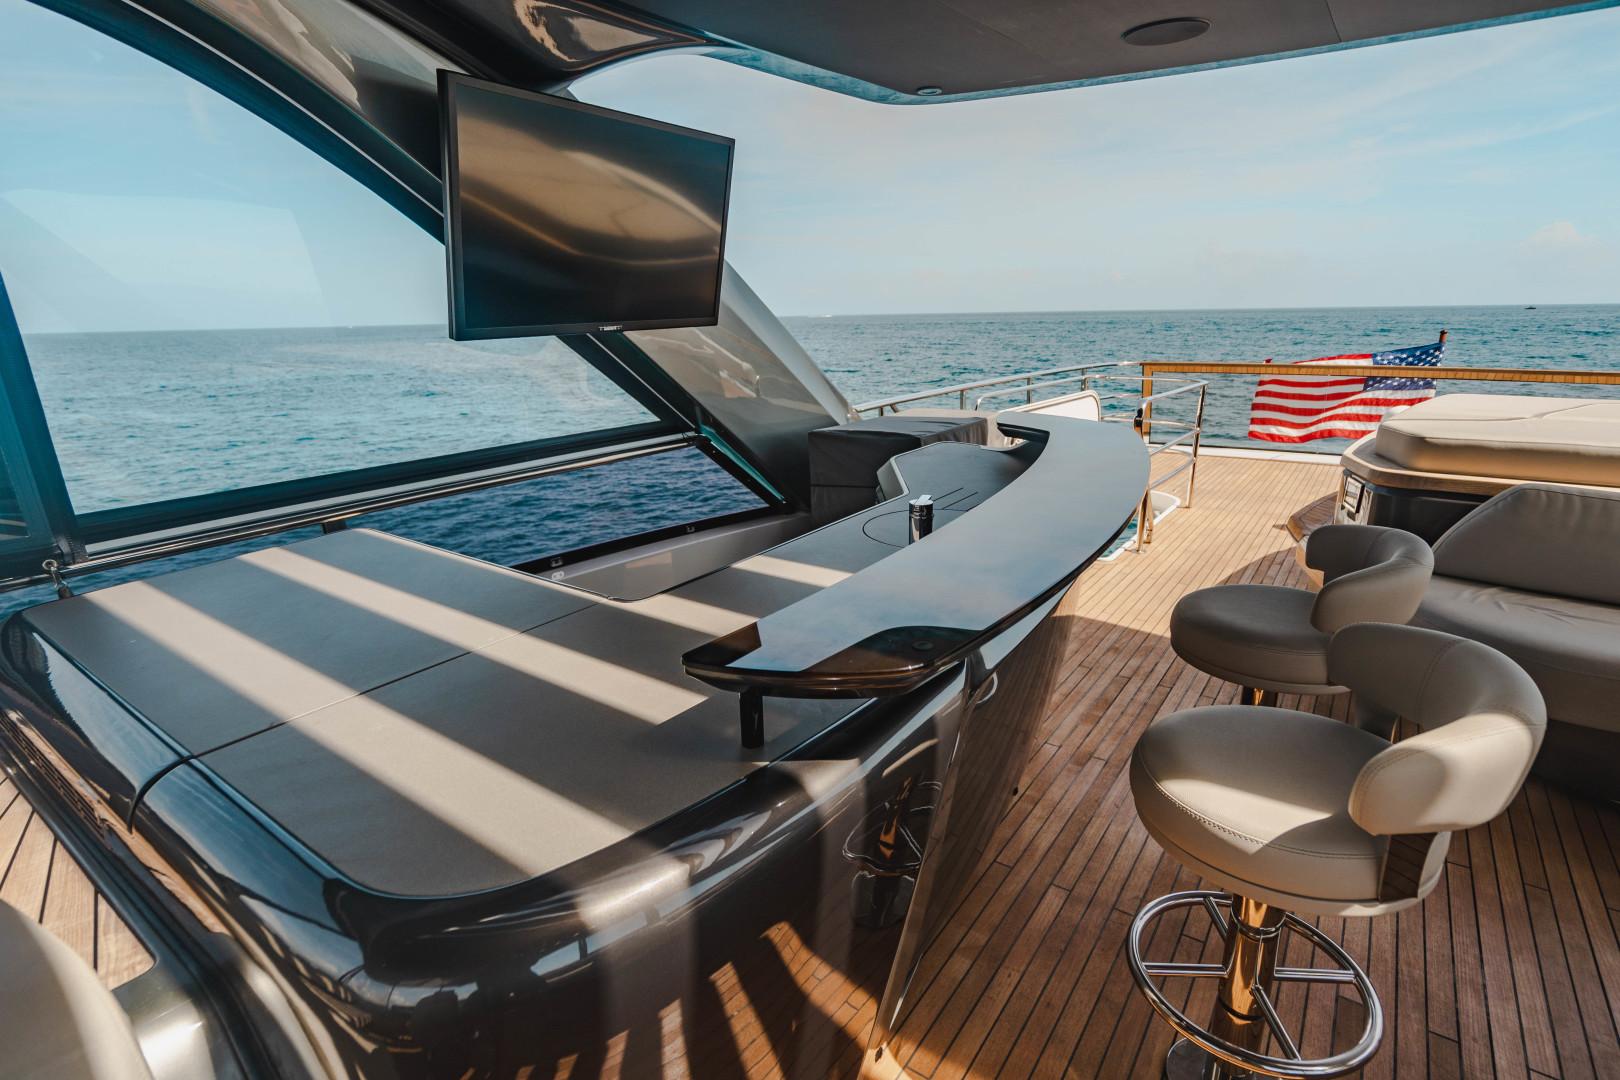 Princess-Y85  2019-Splash Delray Beach-Florida-United States-1631639 | Thumbnail